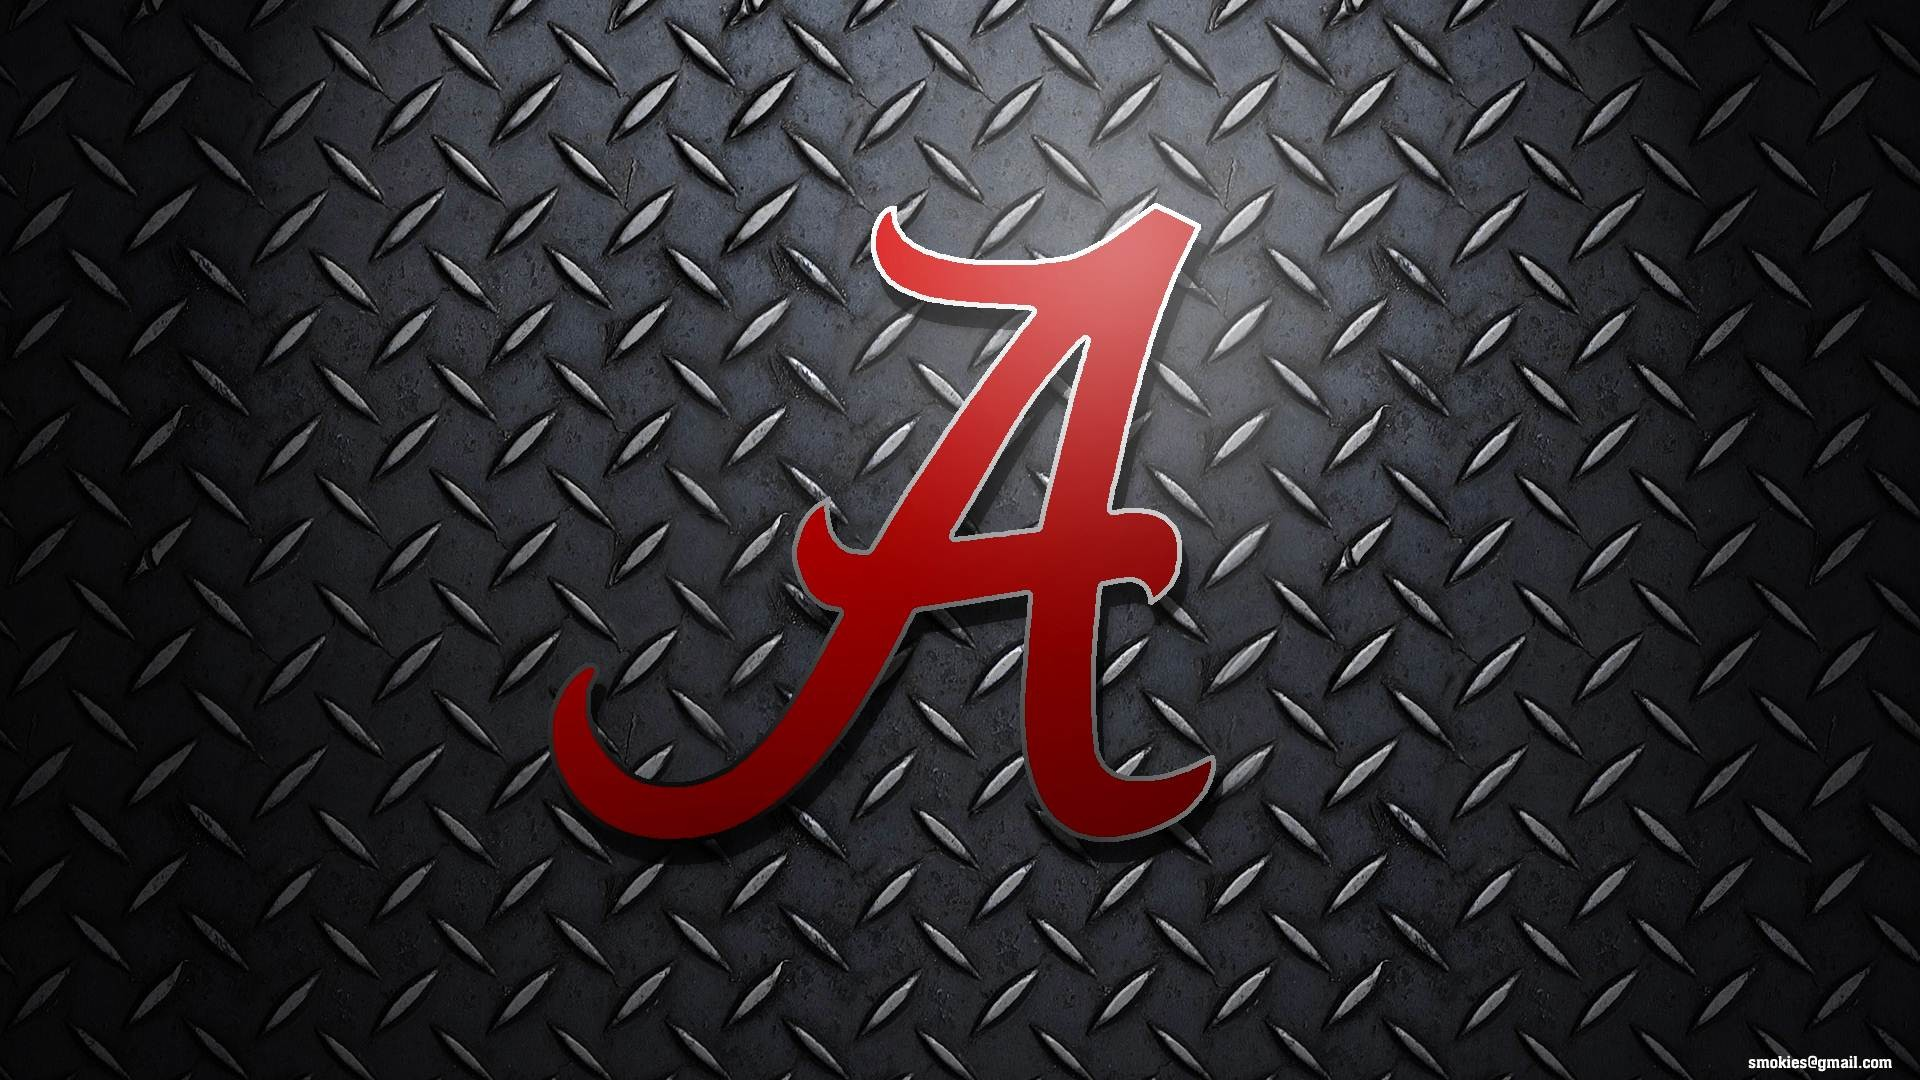 Alabama Crimson Tide Iphone Wallpaper 72 Images